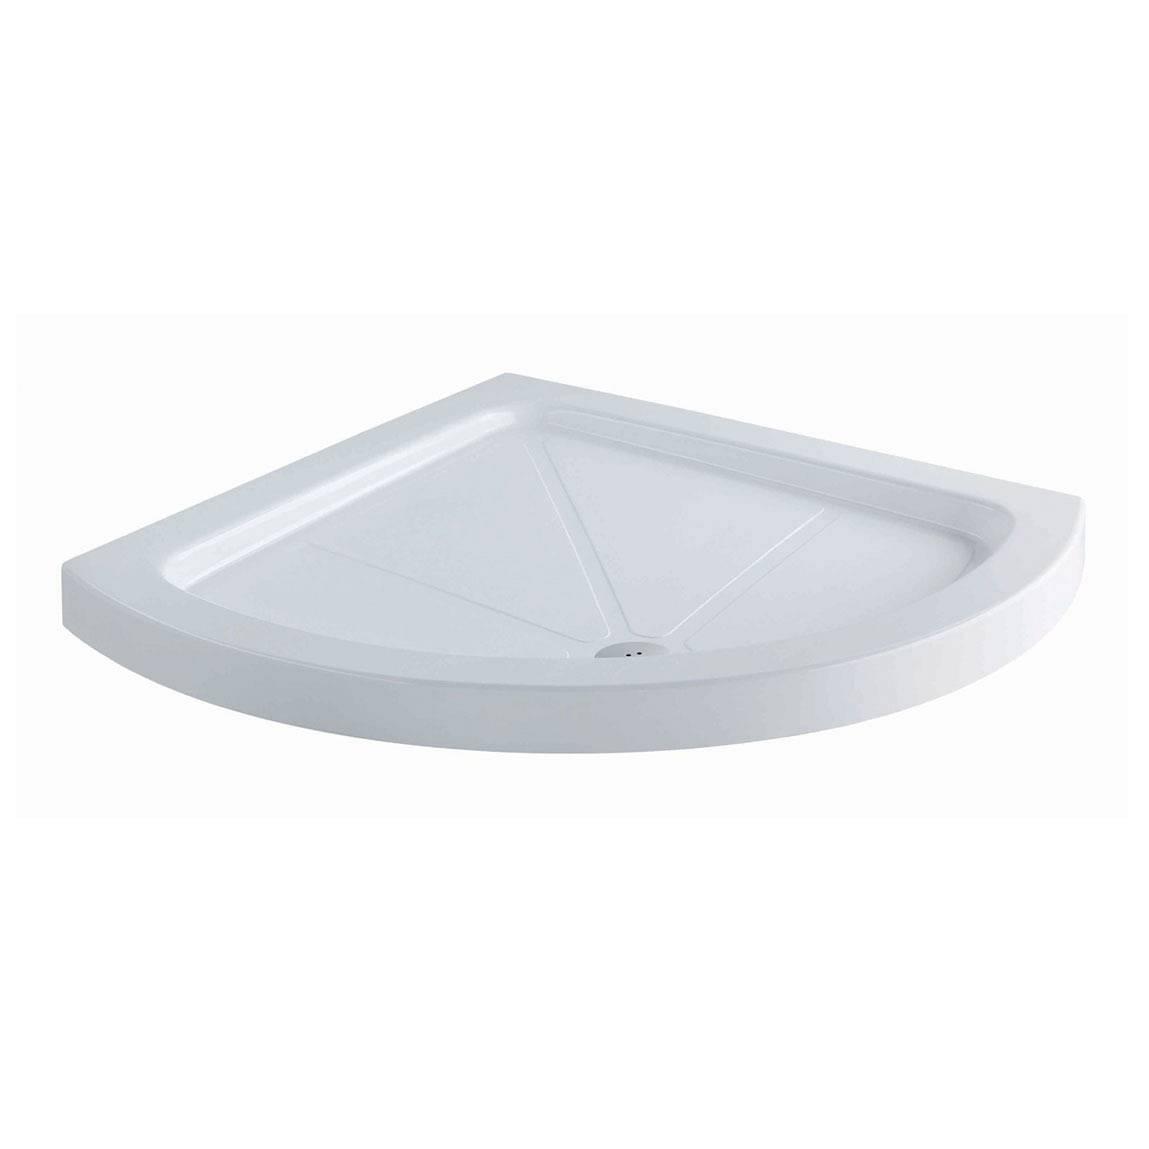 Image of Bow Quadrant Stone Shower Tray 900